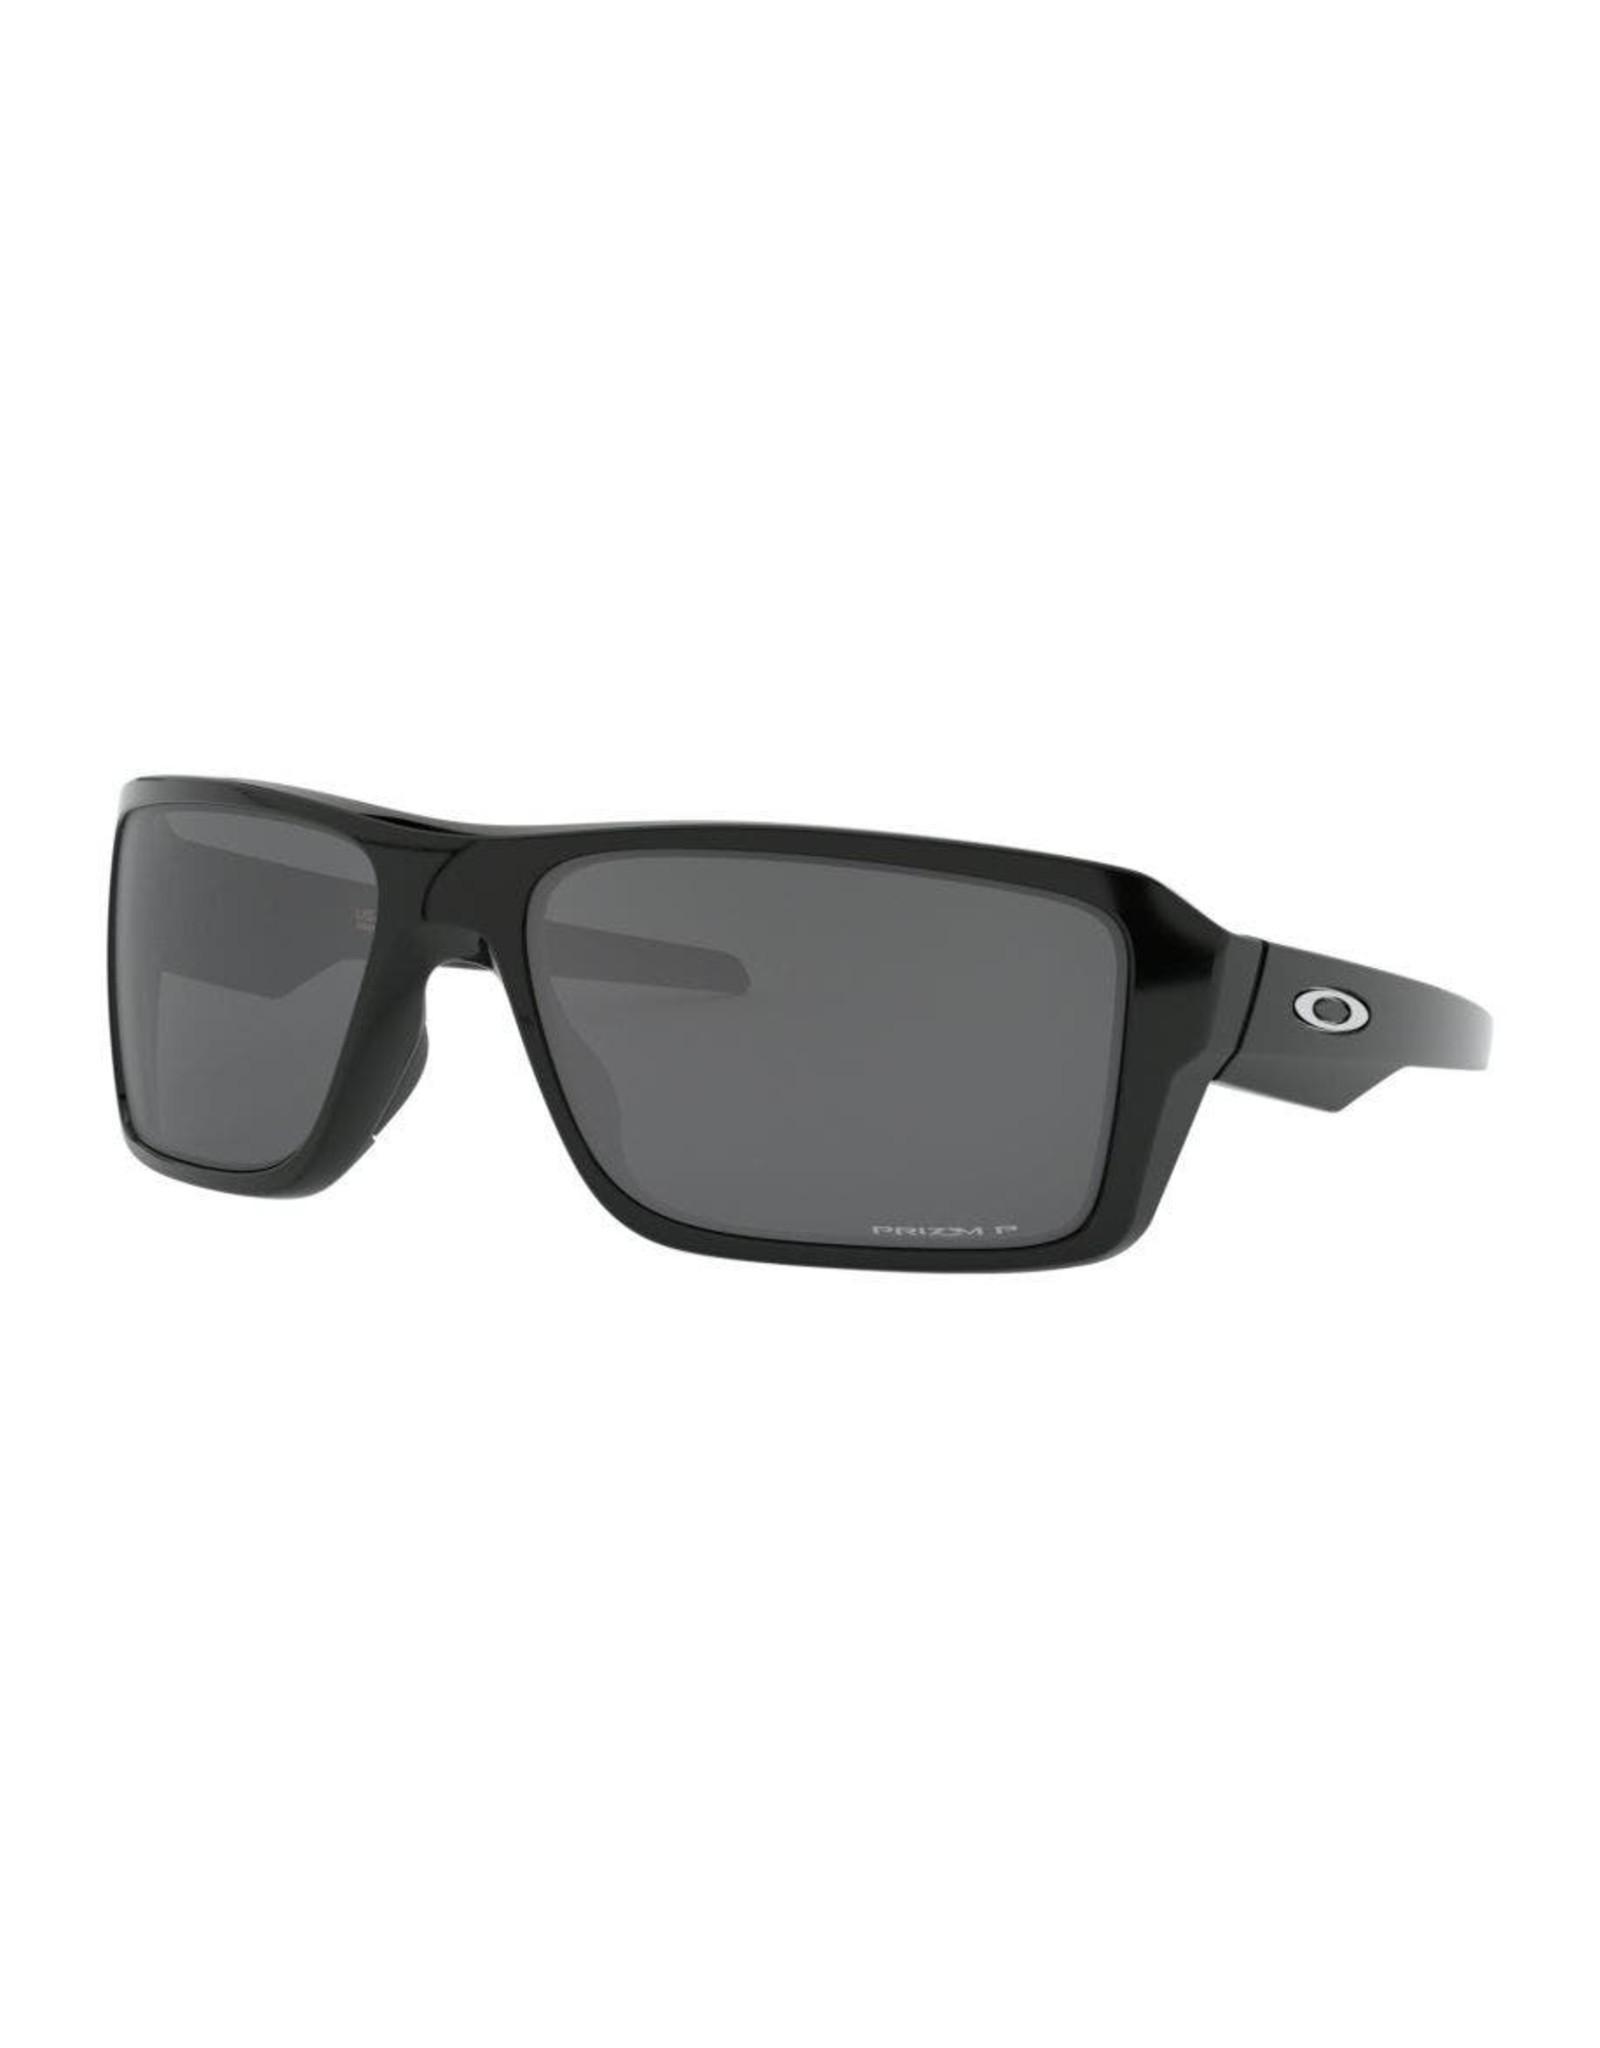 Oakley Mens sunglasses DOUBLE EDGE matte black w/ dark grey